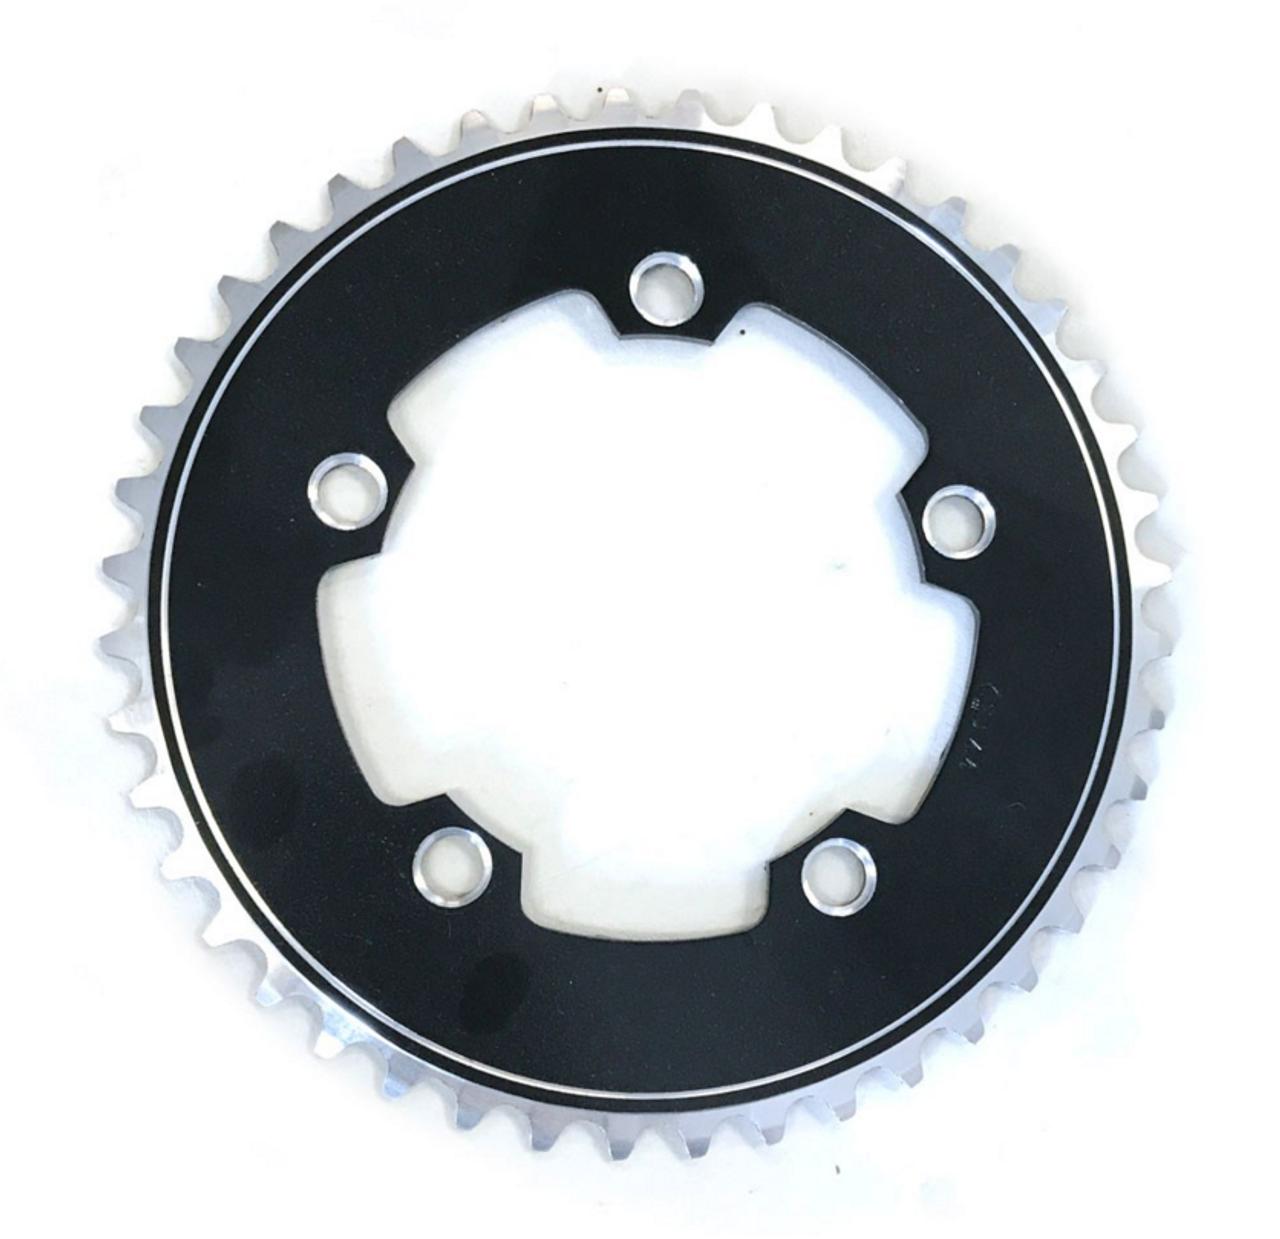 "Gebhardt 1/8"" Track Chainring | Black | 130mm BCD | All Sizes"